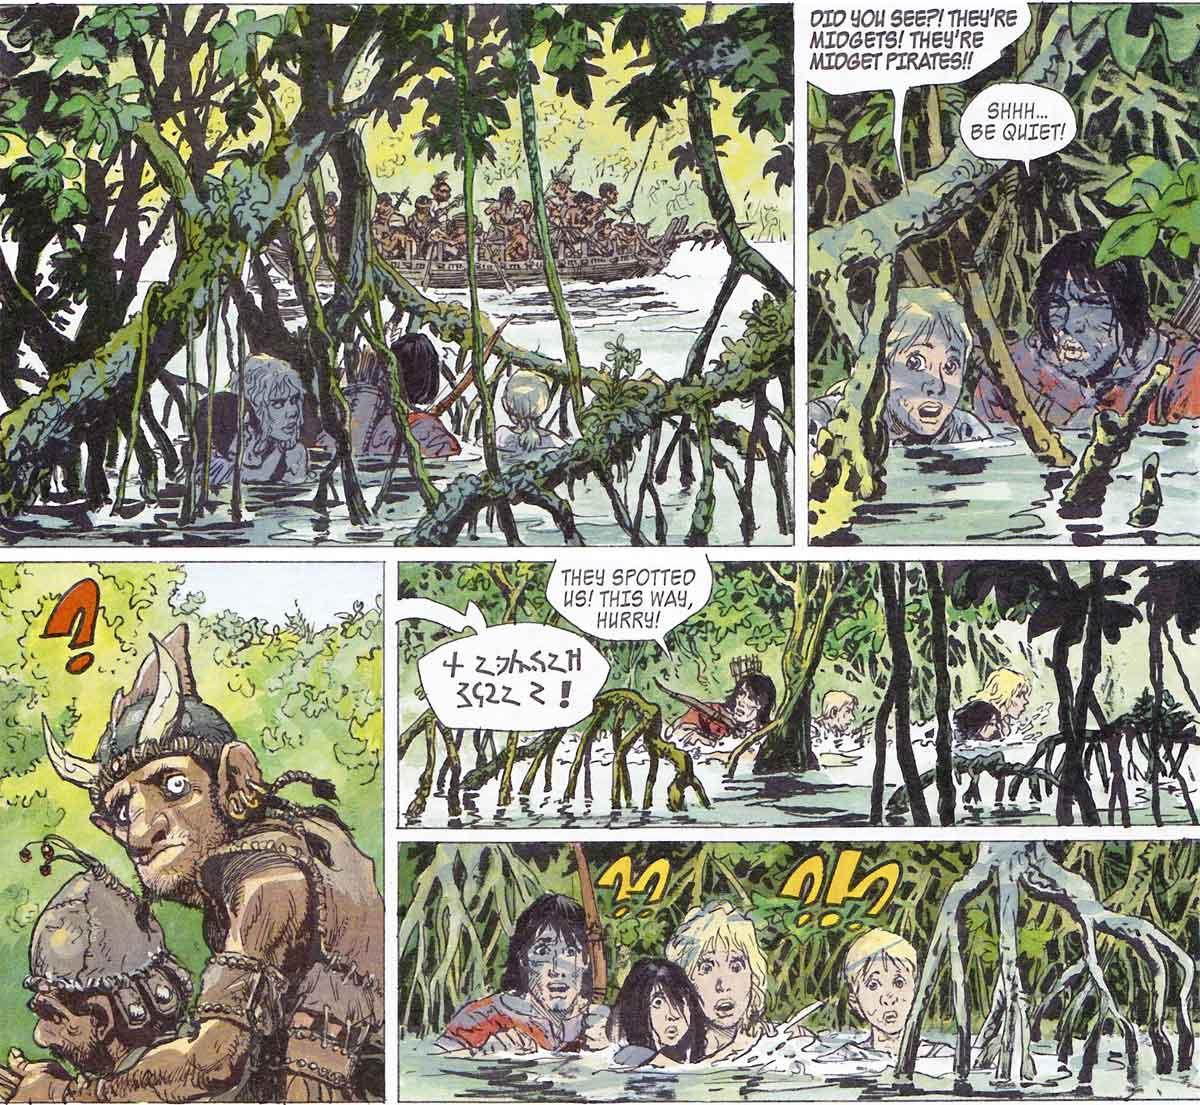 Golem-comics-resena-Thorgal-van-hamme-rosinski-05